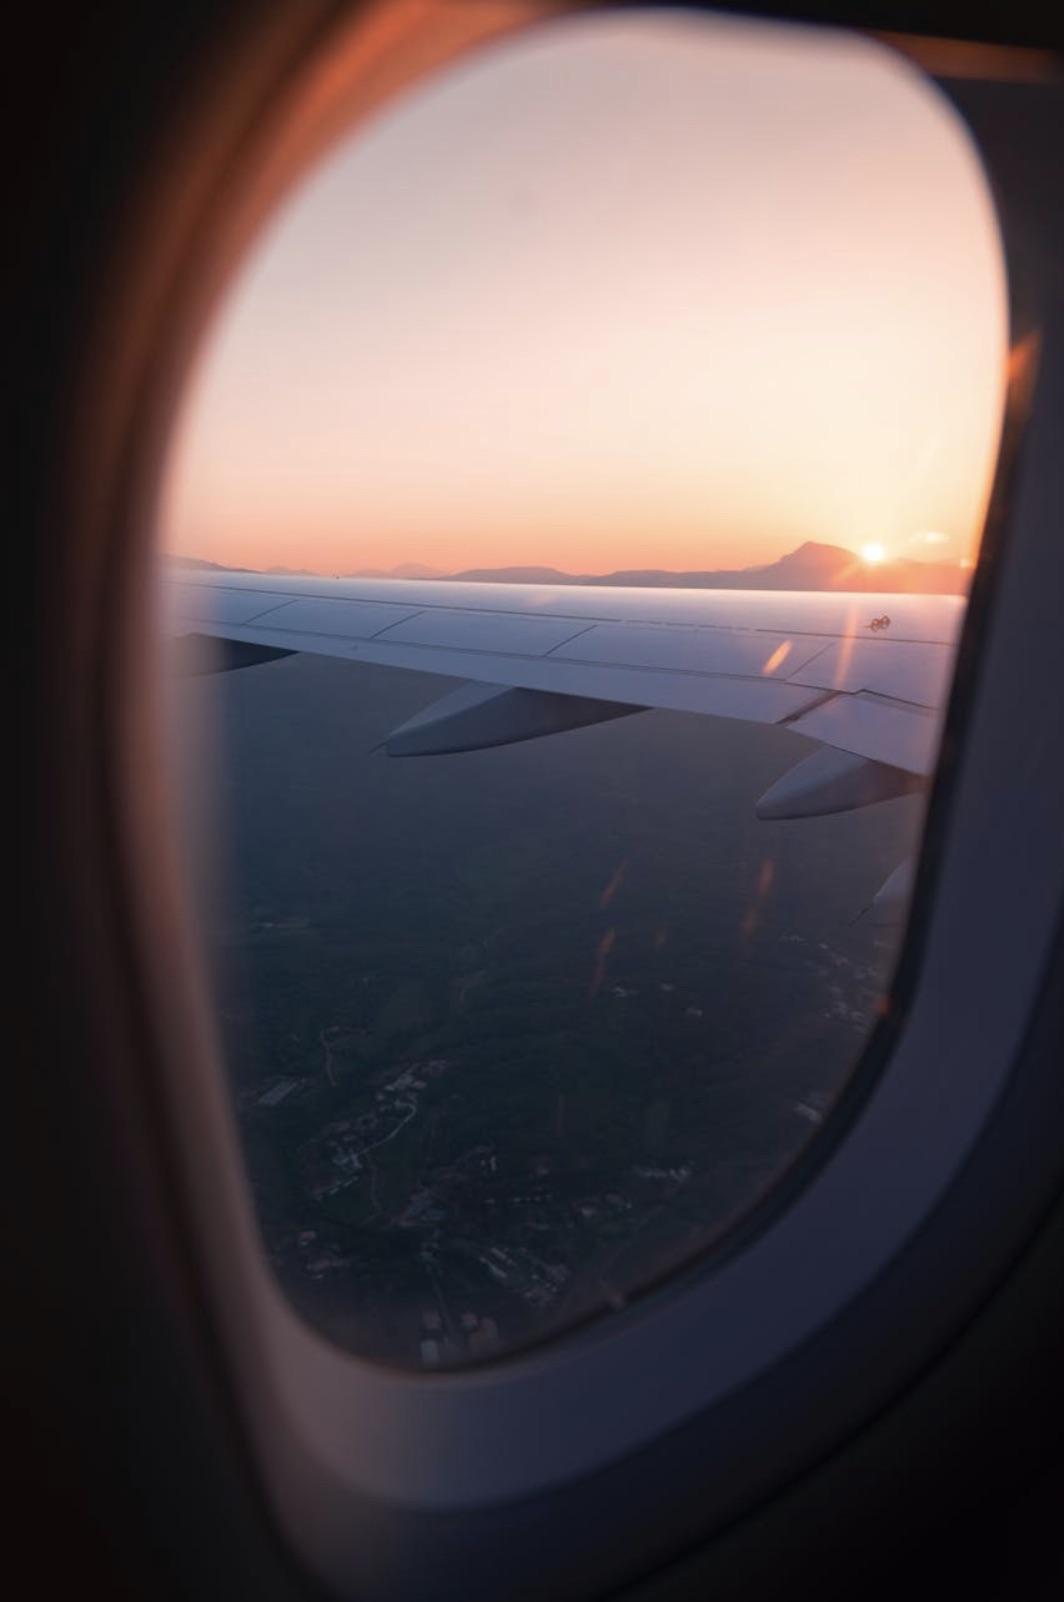 On the go plane